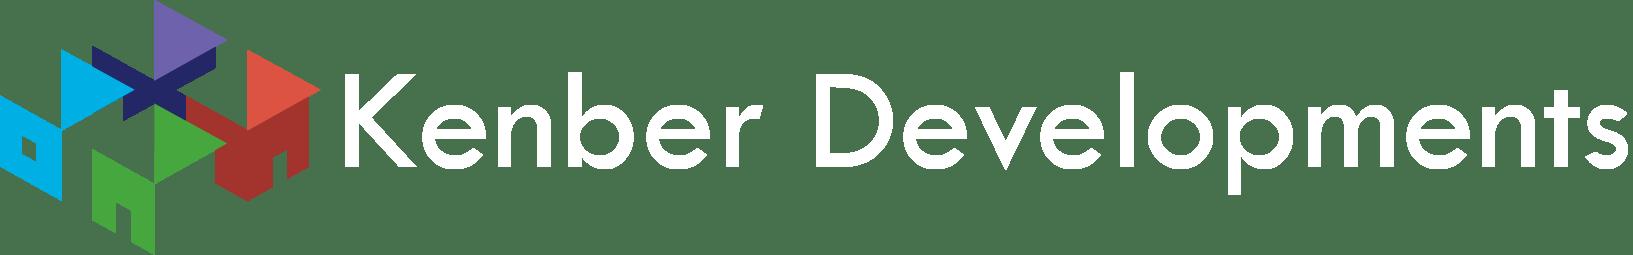 Kenber Developments